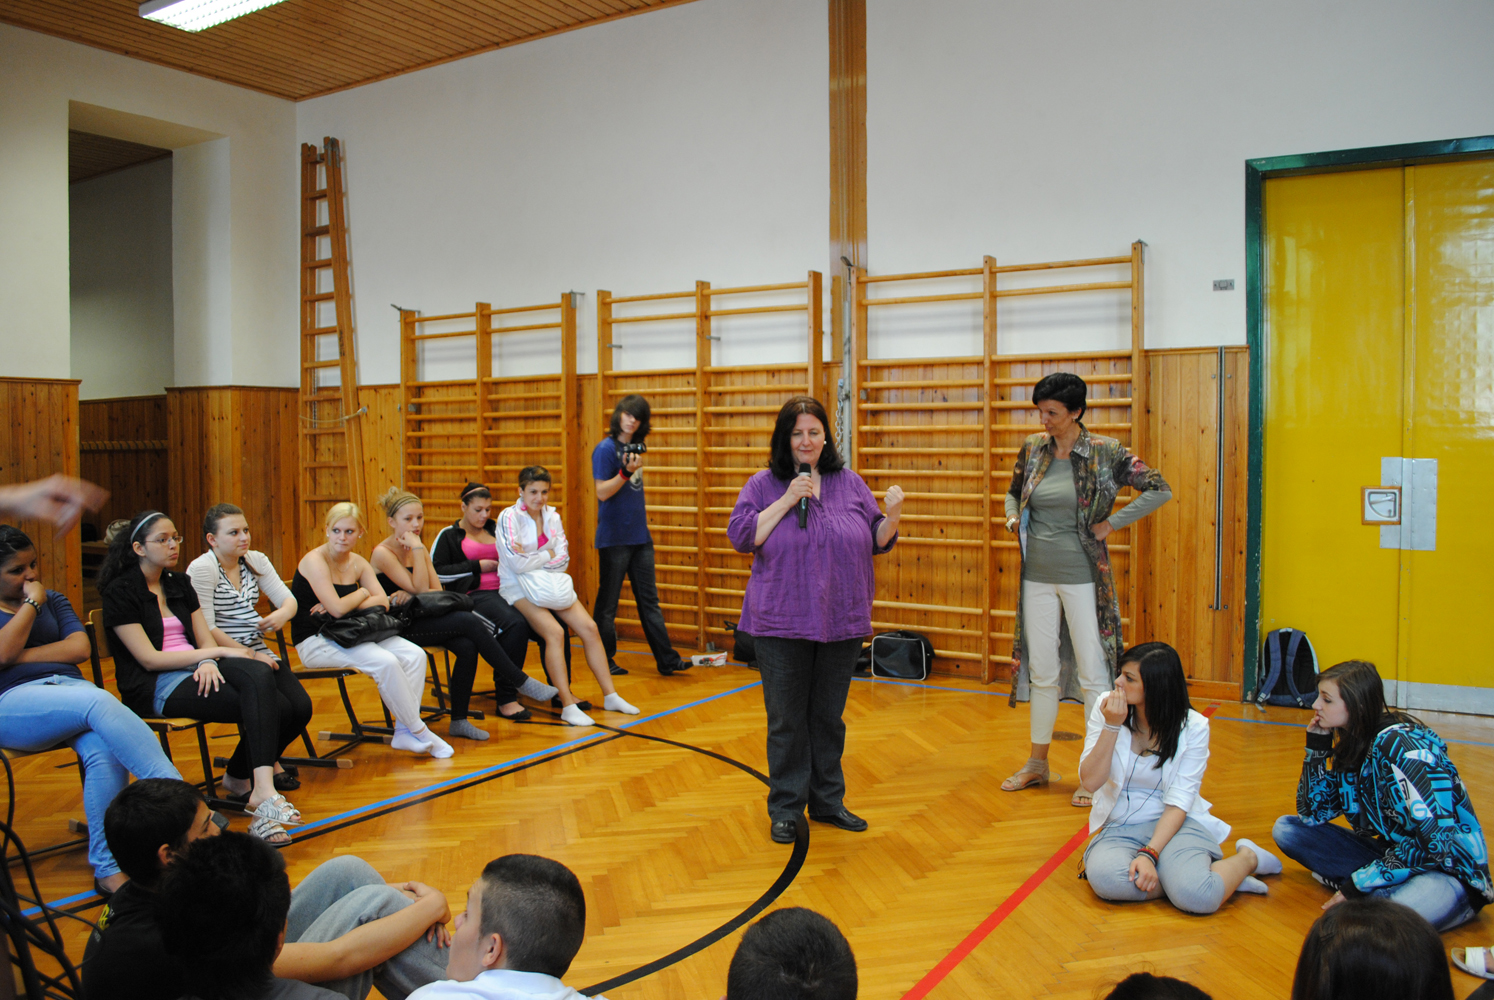 Polytechnische schule wien 10 genprob 003 for Design schule wien